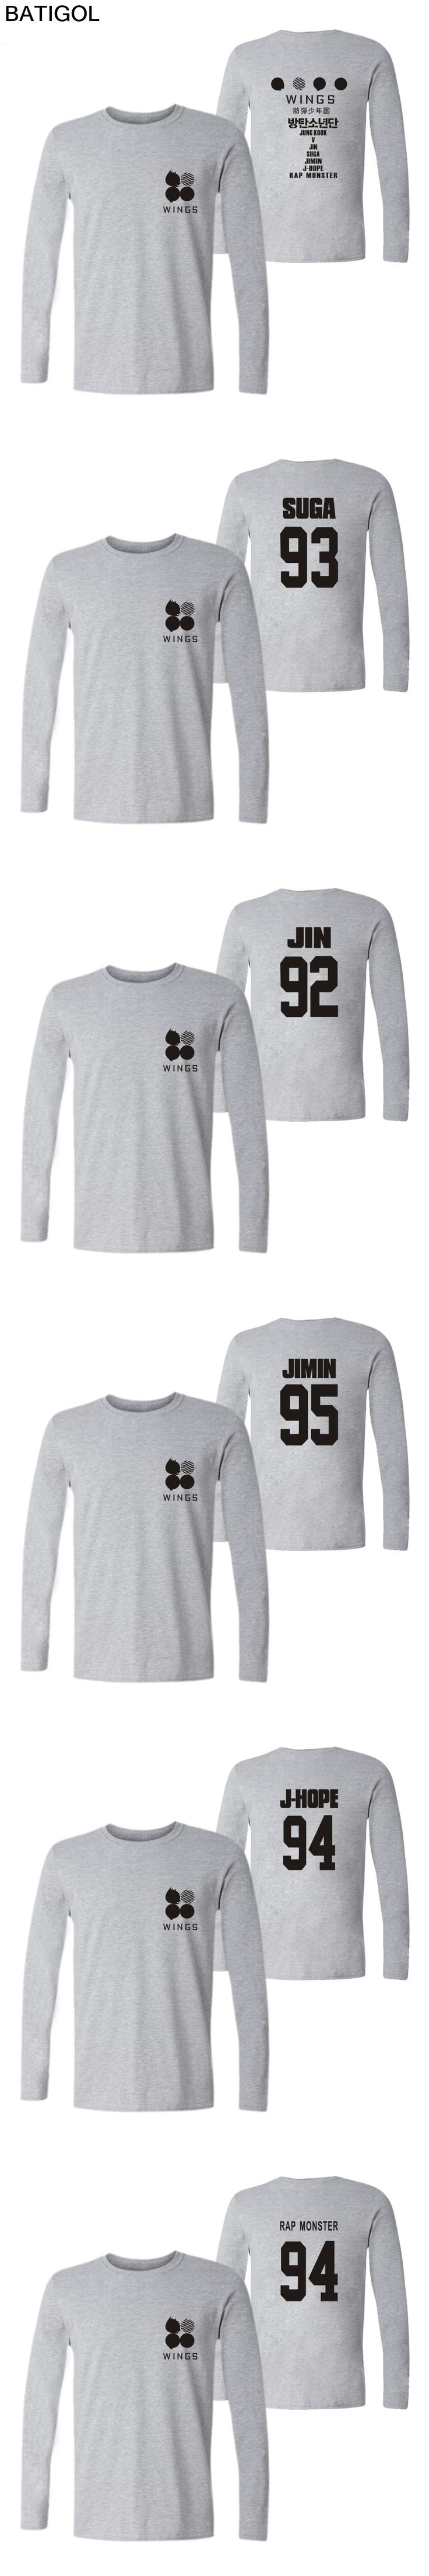 BATIGOL BTS Wings Album T-shirt Long Sleeve Kpop Bangtan Boys T-shirts Frauen Hip Hop Men Casual Fashion Streetwear Tee Shirts